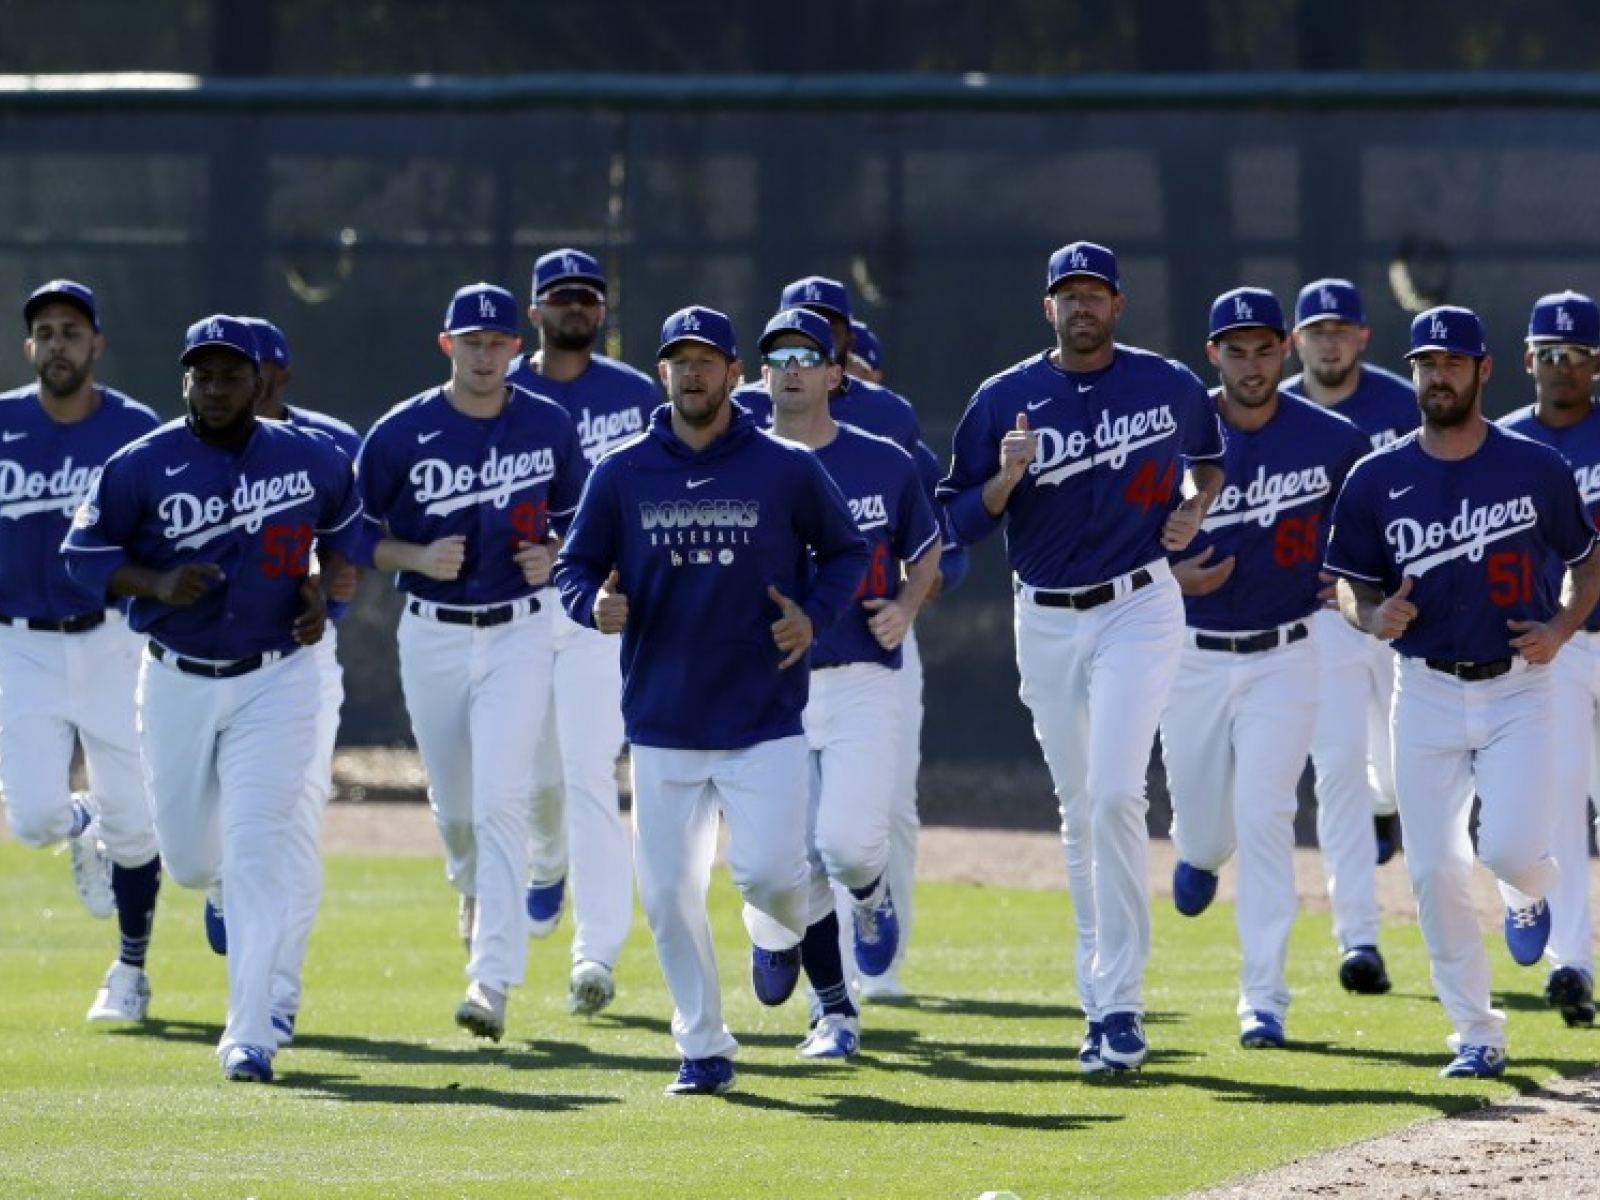 Main image for event titled LA Dodgers vs. LA Angels